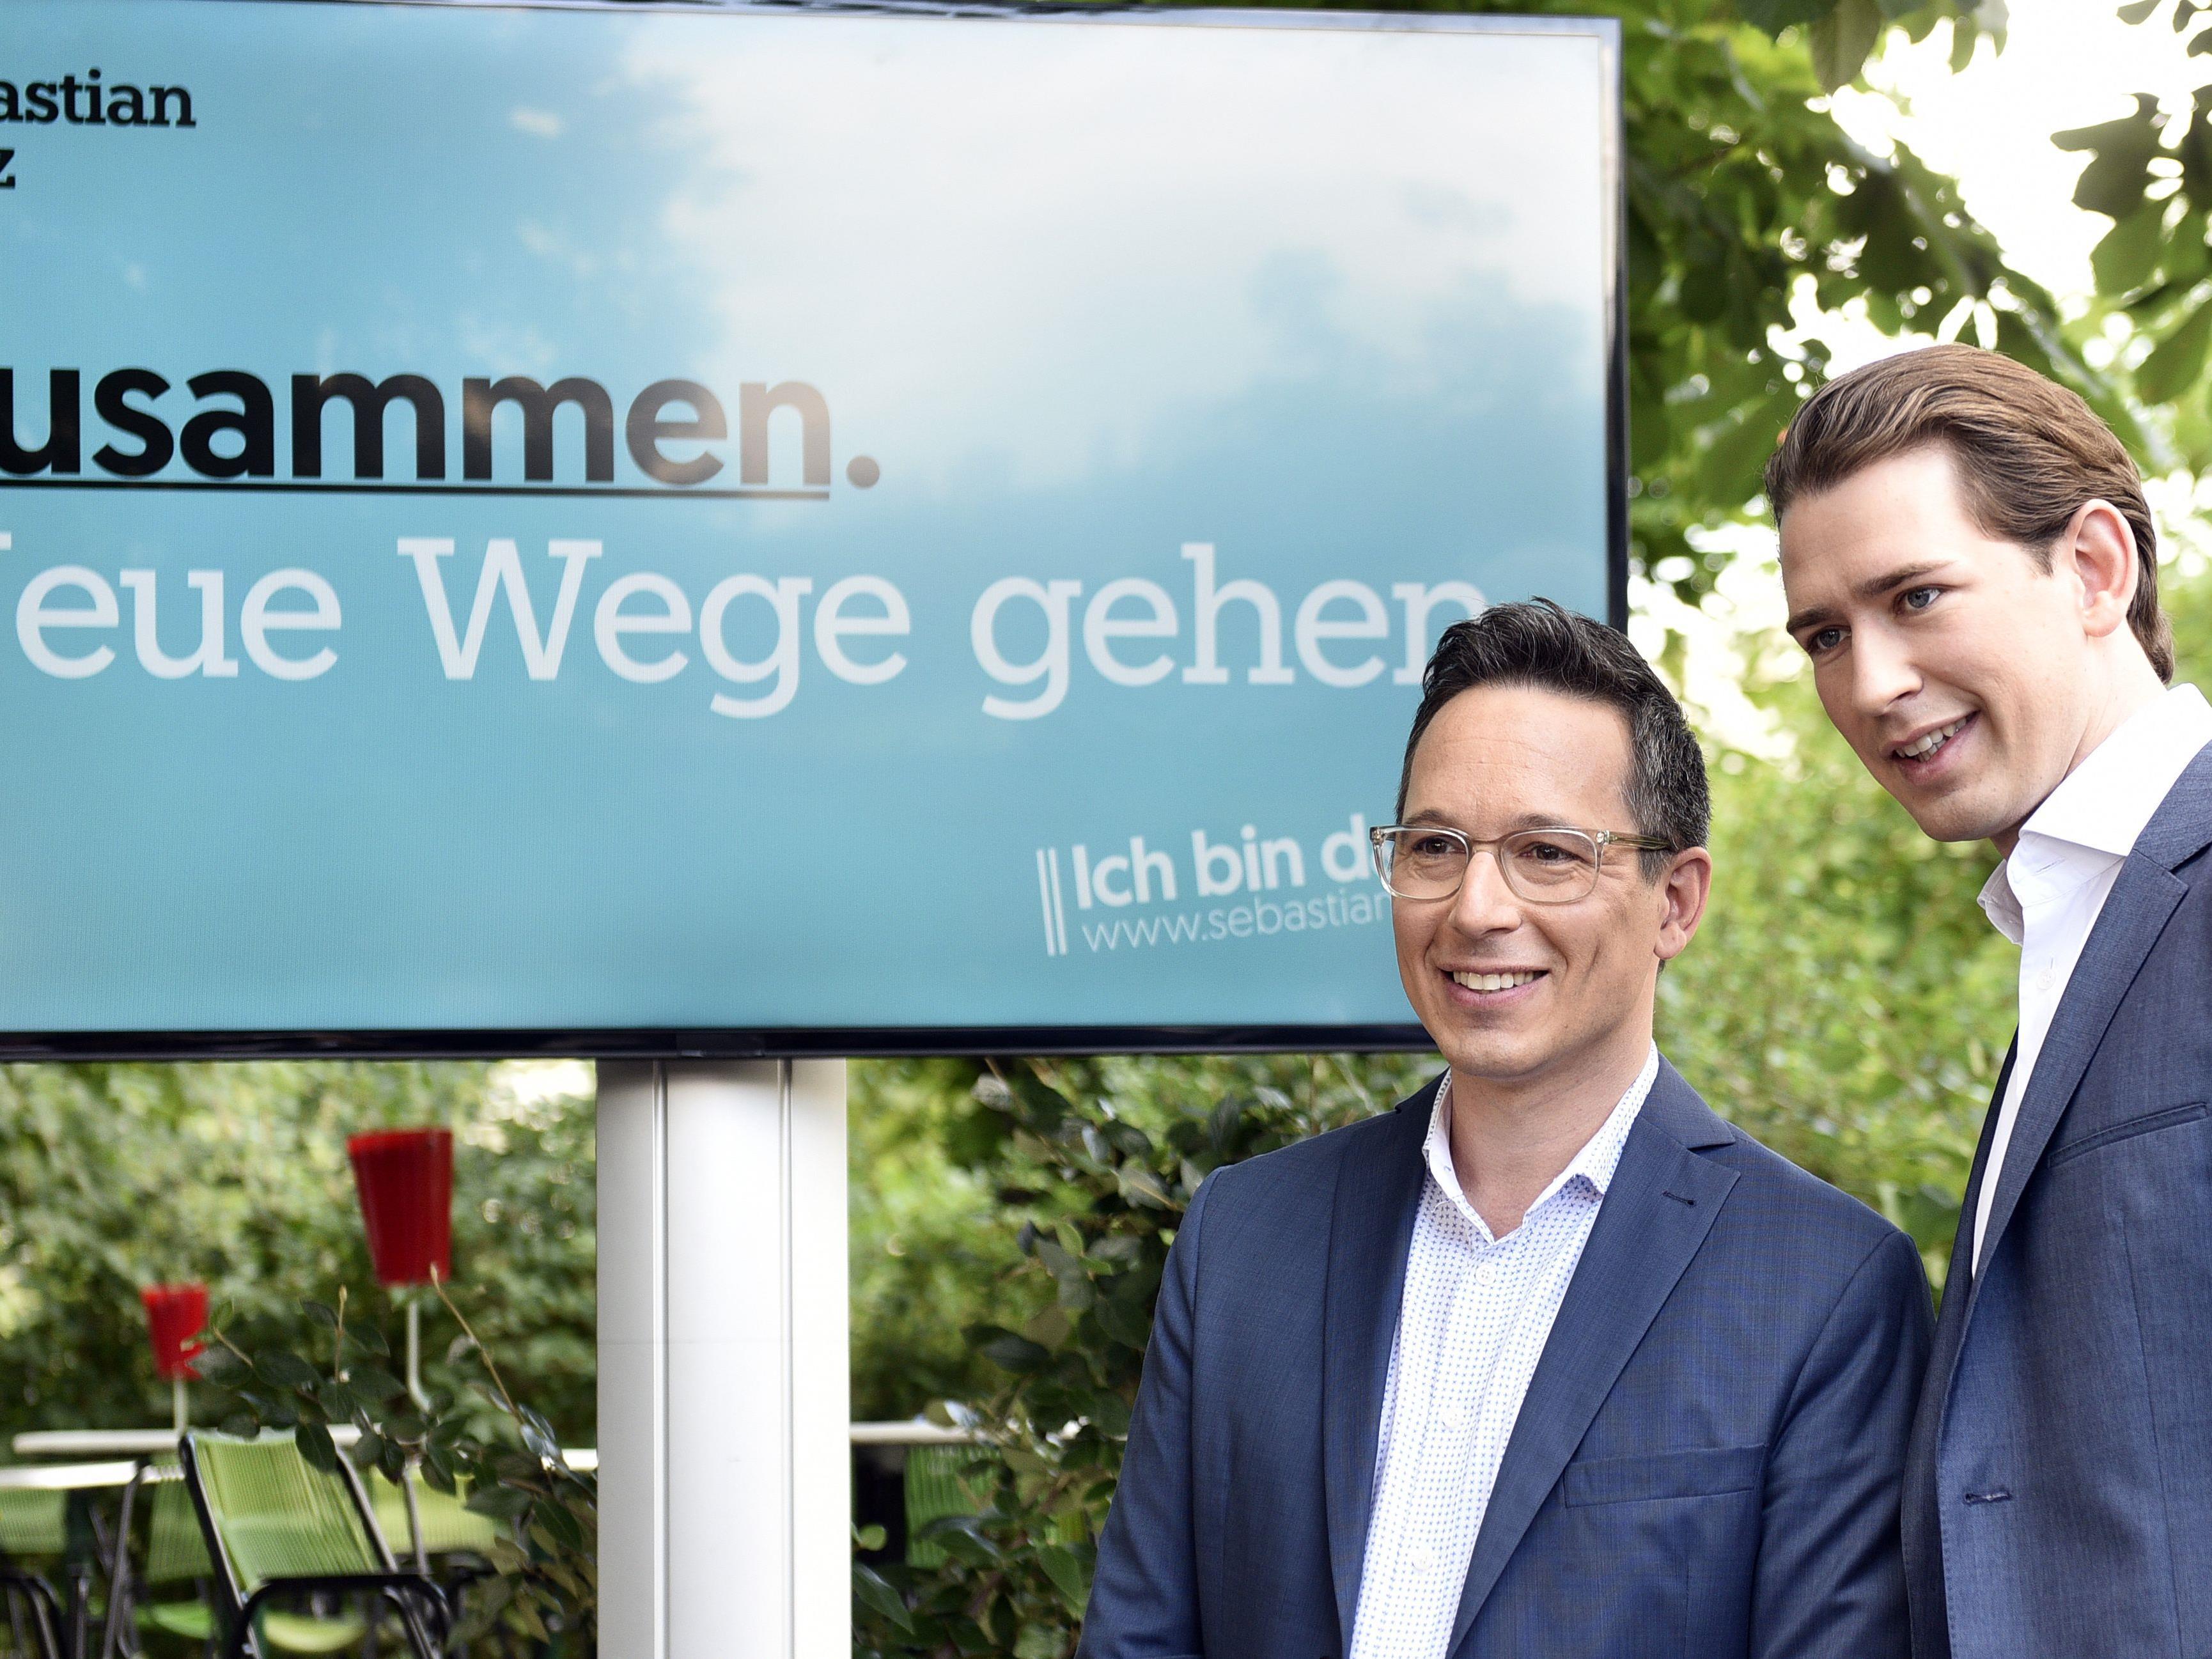 "(v.l.), Peter L. Eppinger, BM Sebastian Kurz (ÖVP) bei der Präsentation des Sprechers der Bewegung ""Liste Sebastian Kurz - Die neue Volkspartei"""